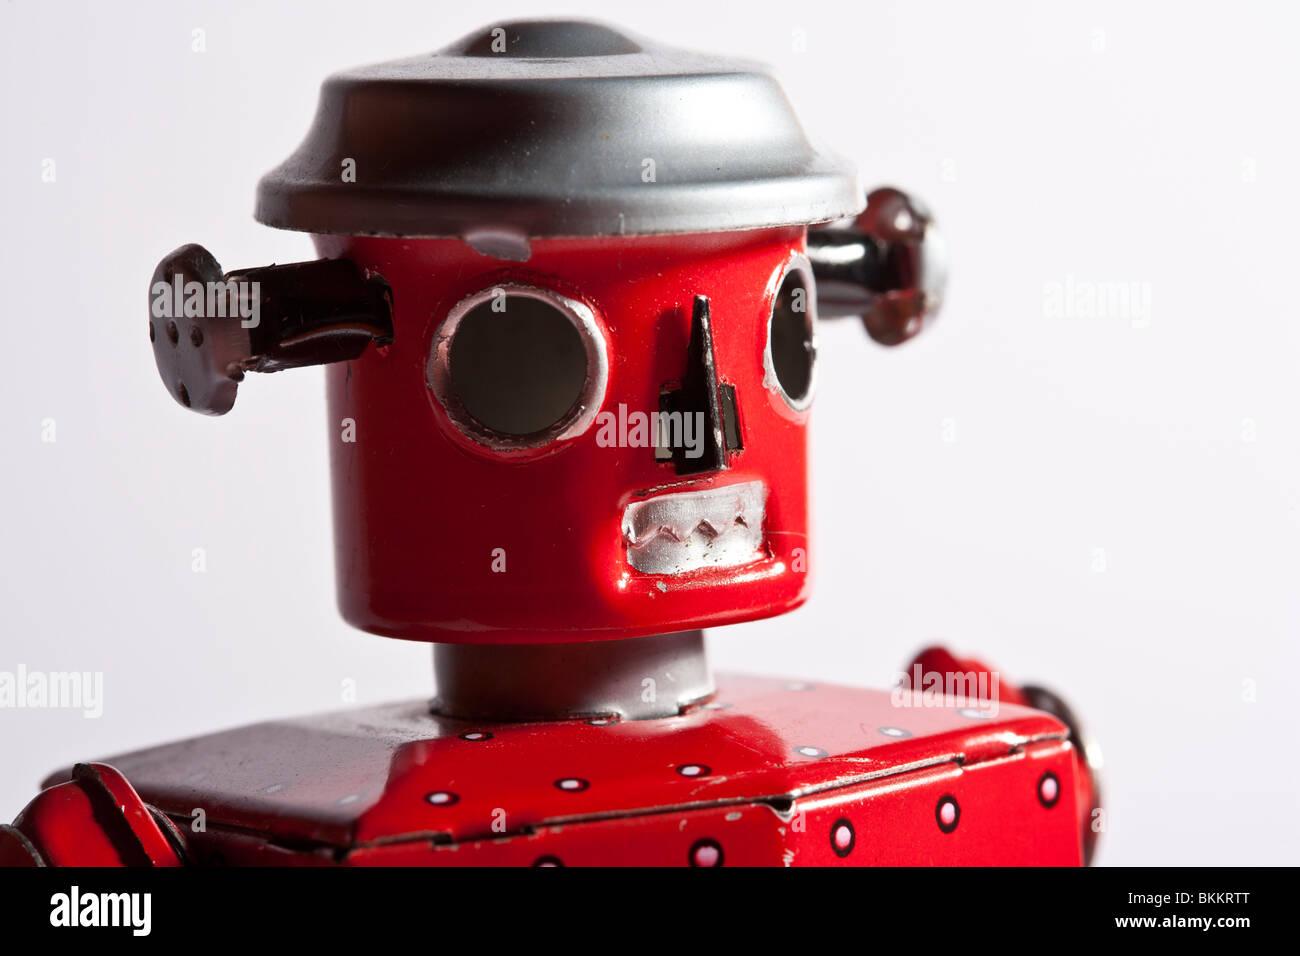 Retro red tinplate toy robot - Stock Image